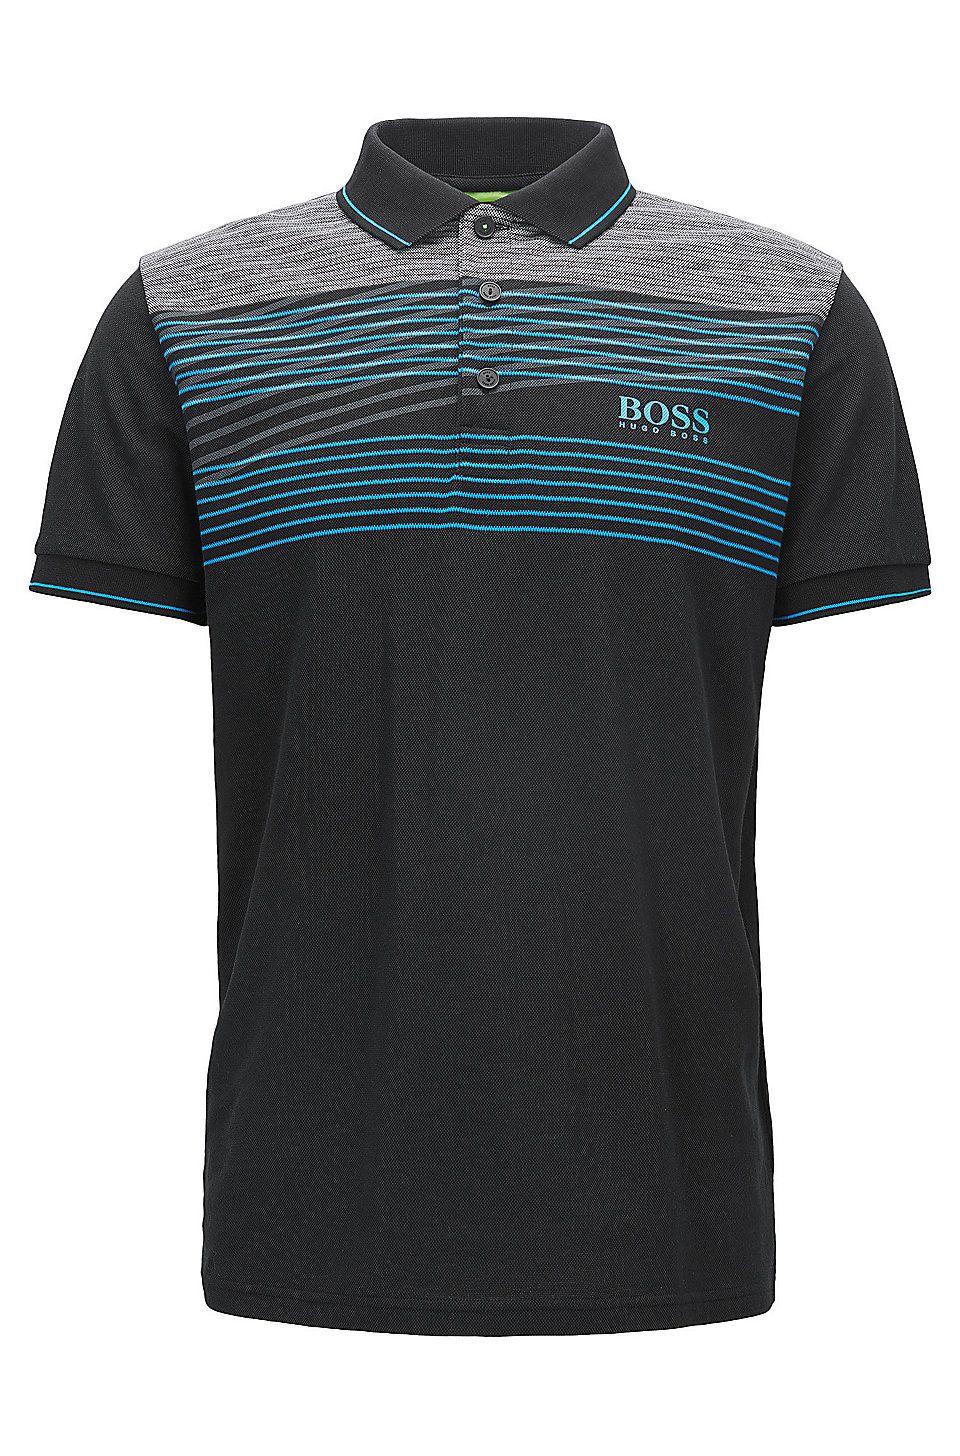 Cotton Blend Polo Shirt, Regular Fit | Paddy Pro. Cotton Blend Polo Shirt,  Slim Fit | Paddy Pro Black from BOSS Green ...